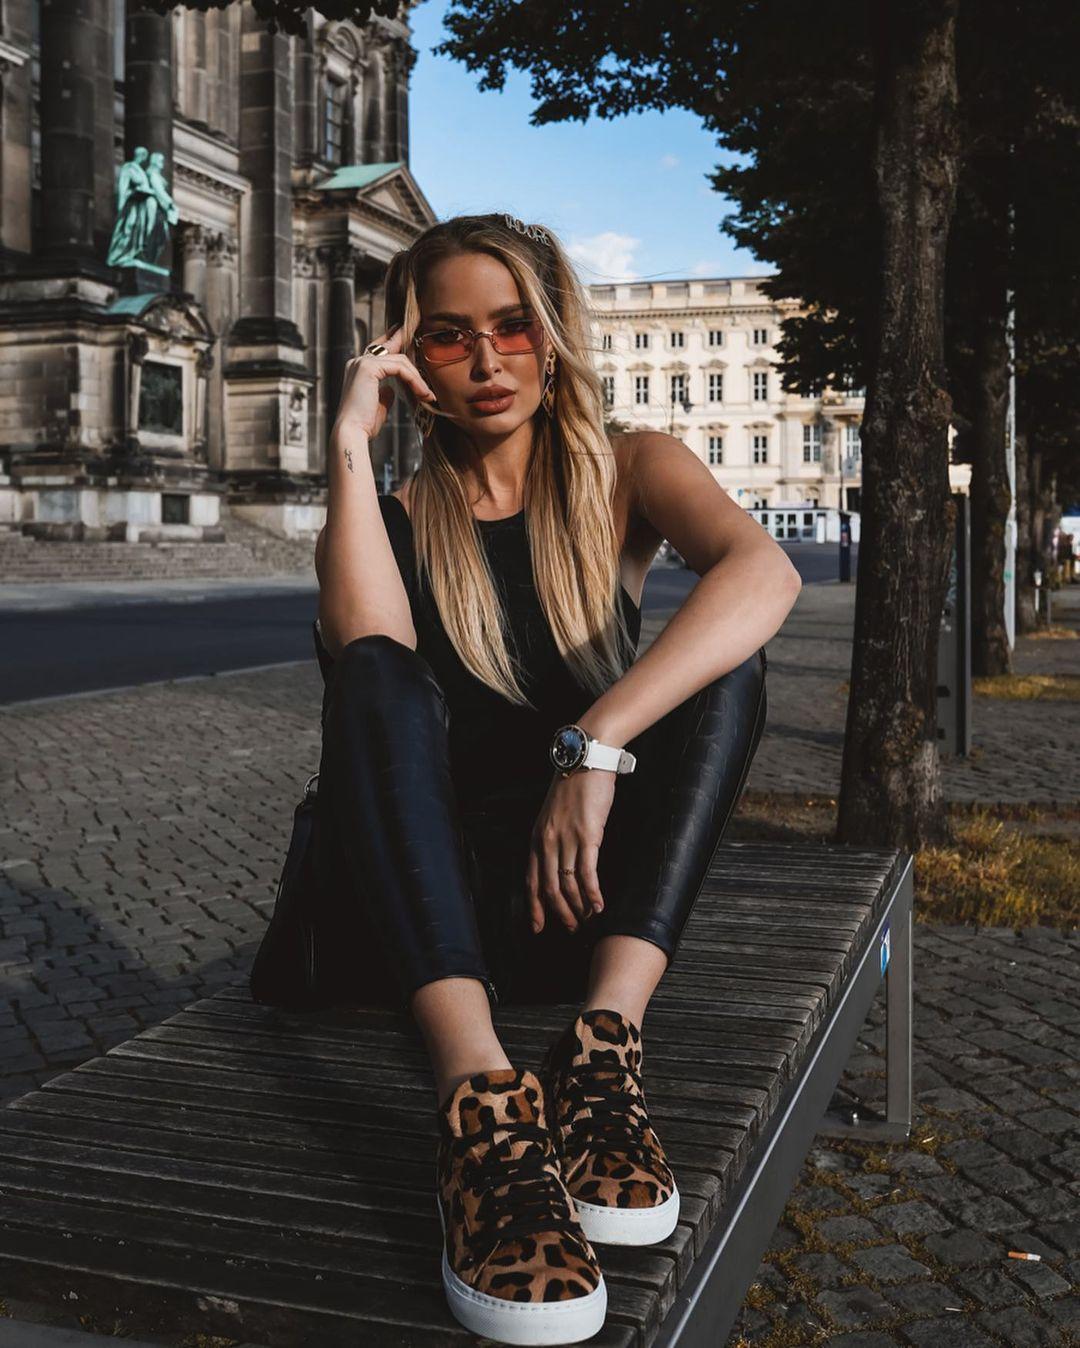 Elena-Kamperi-Wallpapers-Insta-Fit-Bio-10